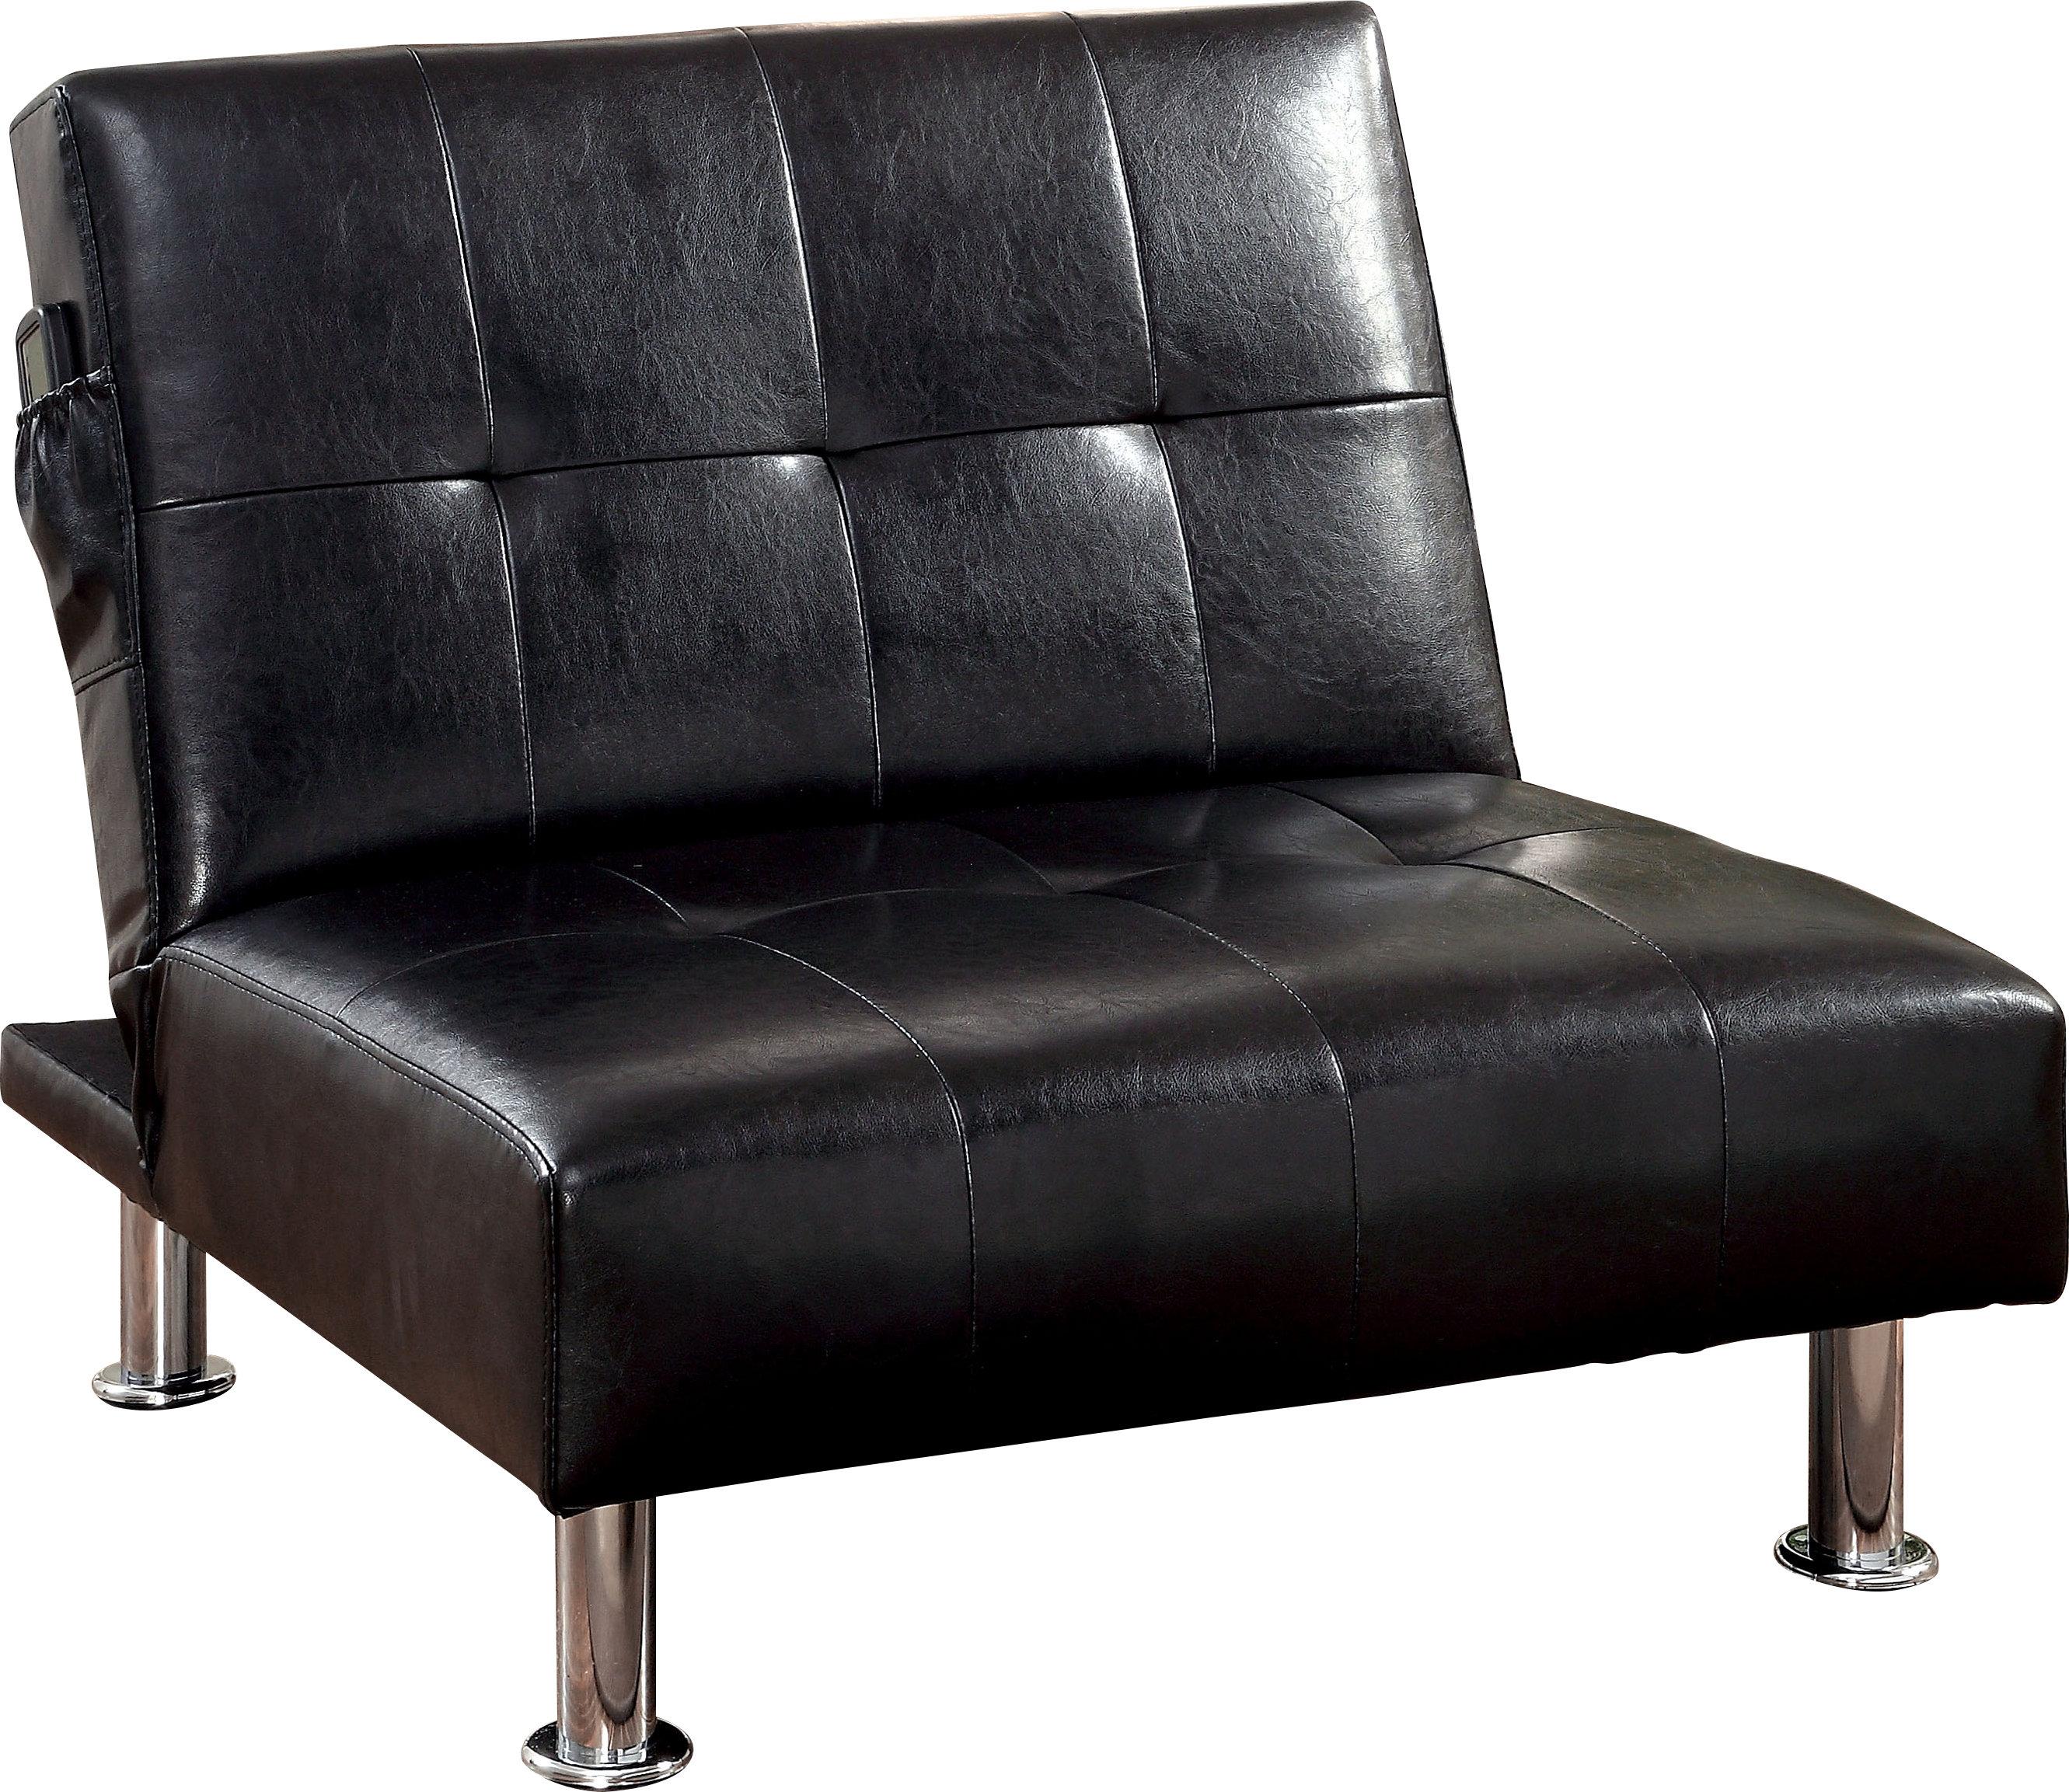 Astounding Latitude Run Perz Convertible Chair Reviews Wayfair Inzonedesignstudio Interior Chair Design Inzonedesignstudiocom